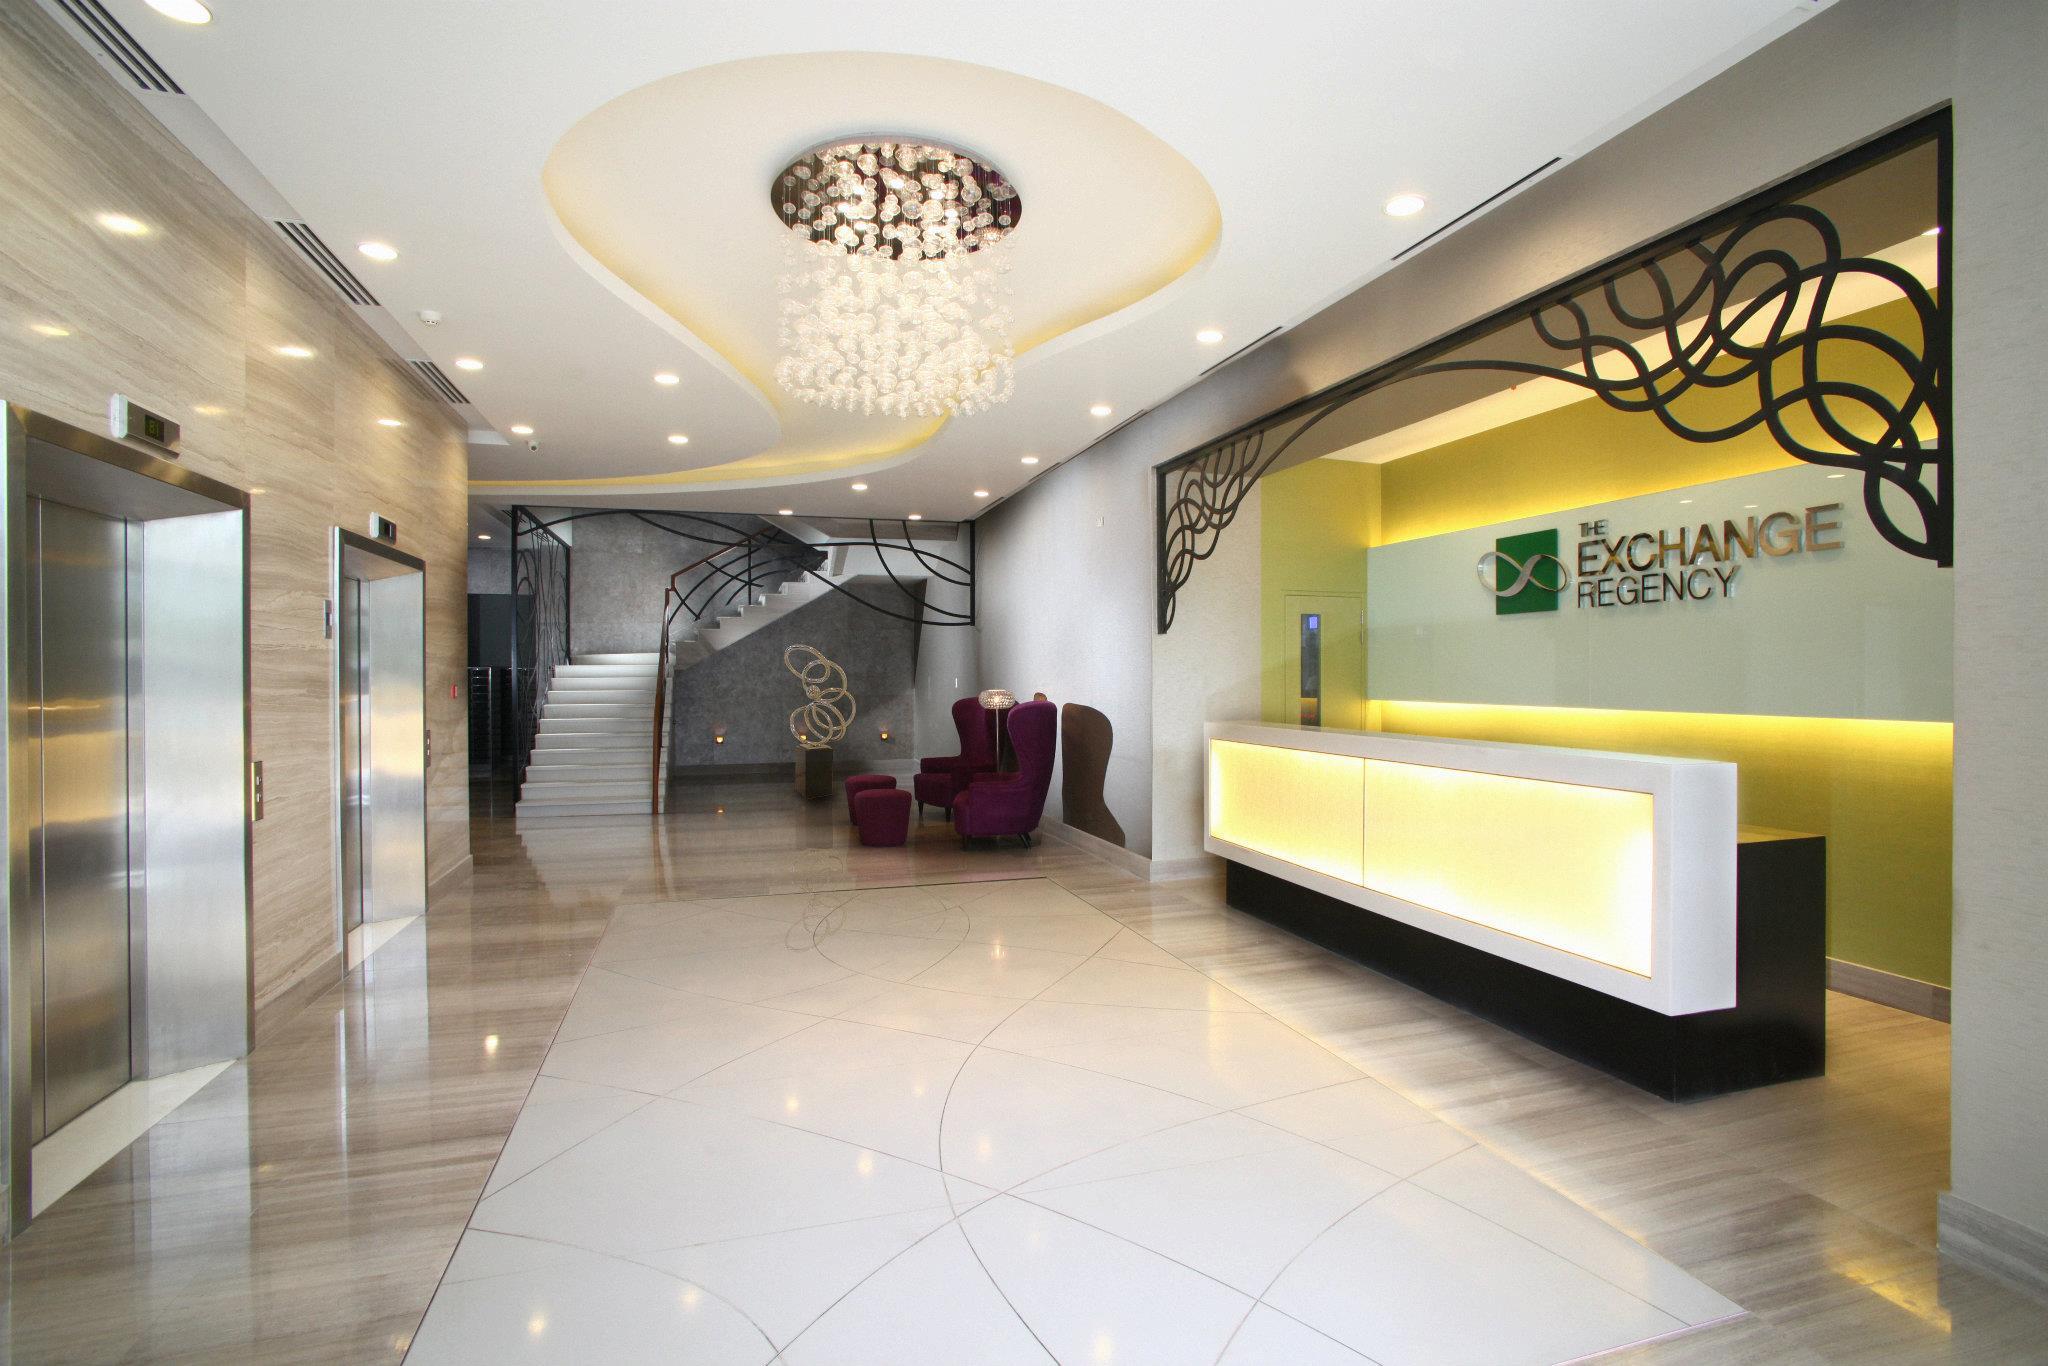 Lobby of The Exchange Regency Hotel